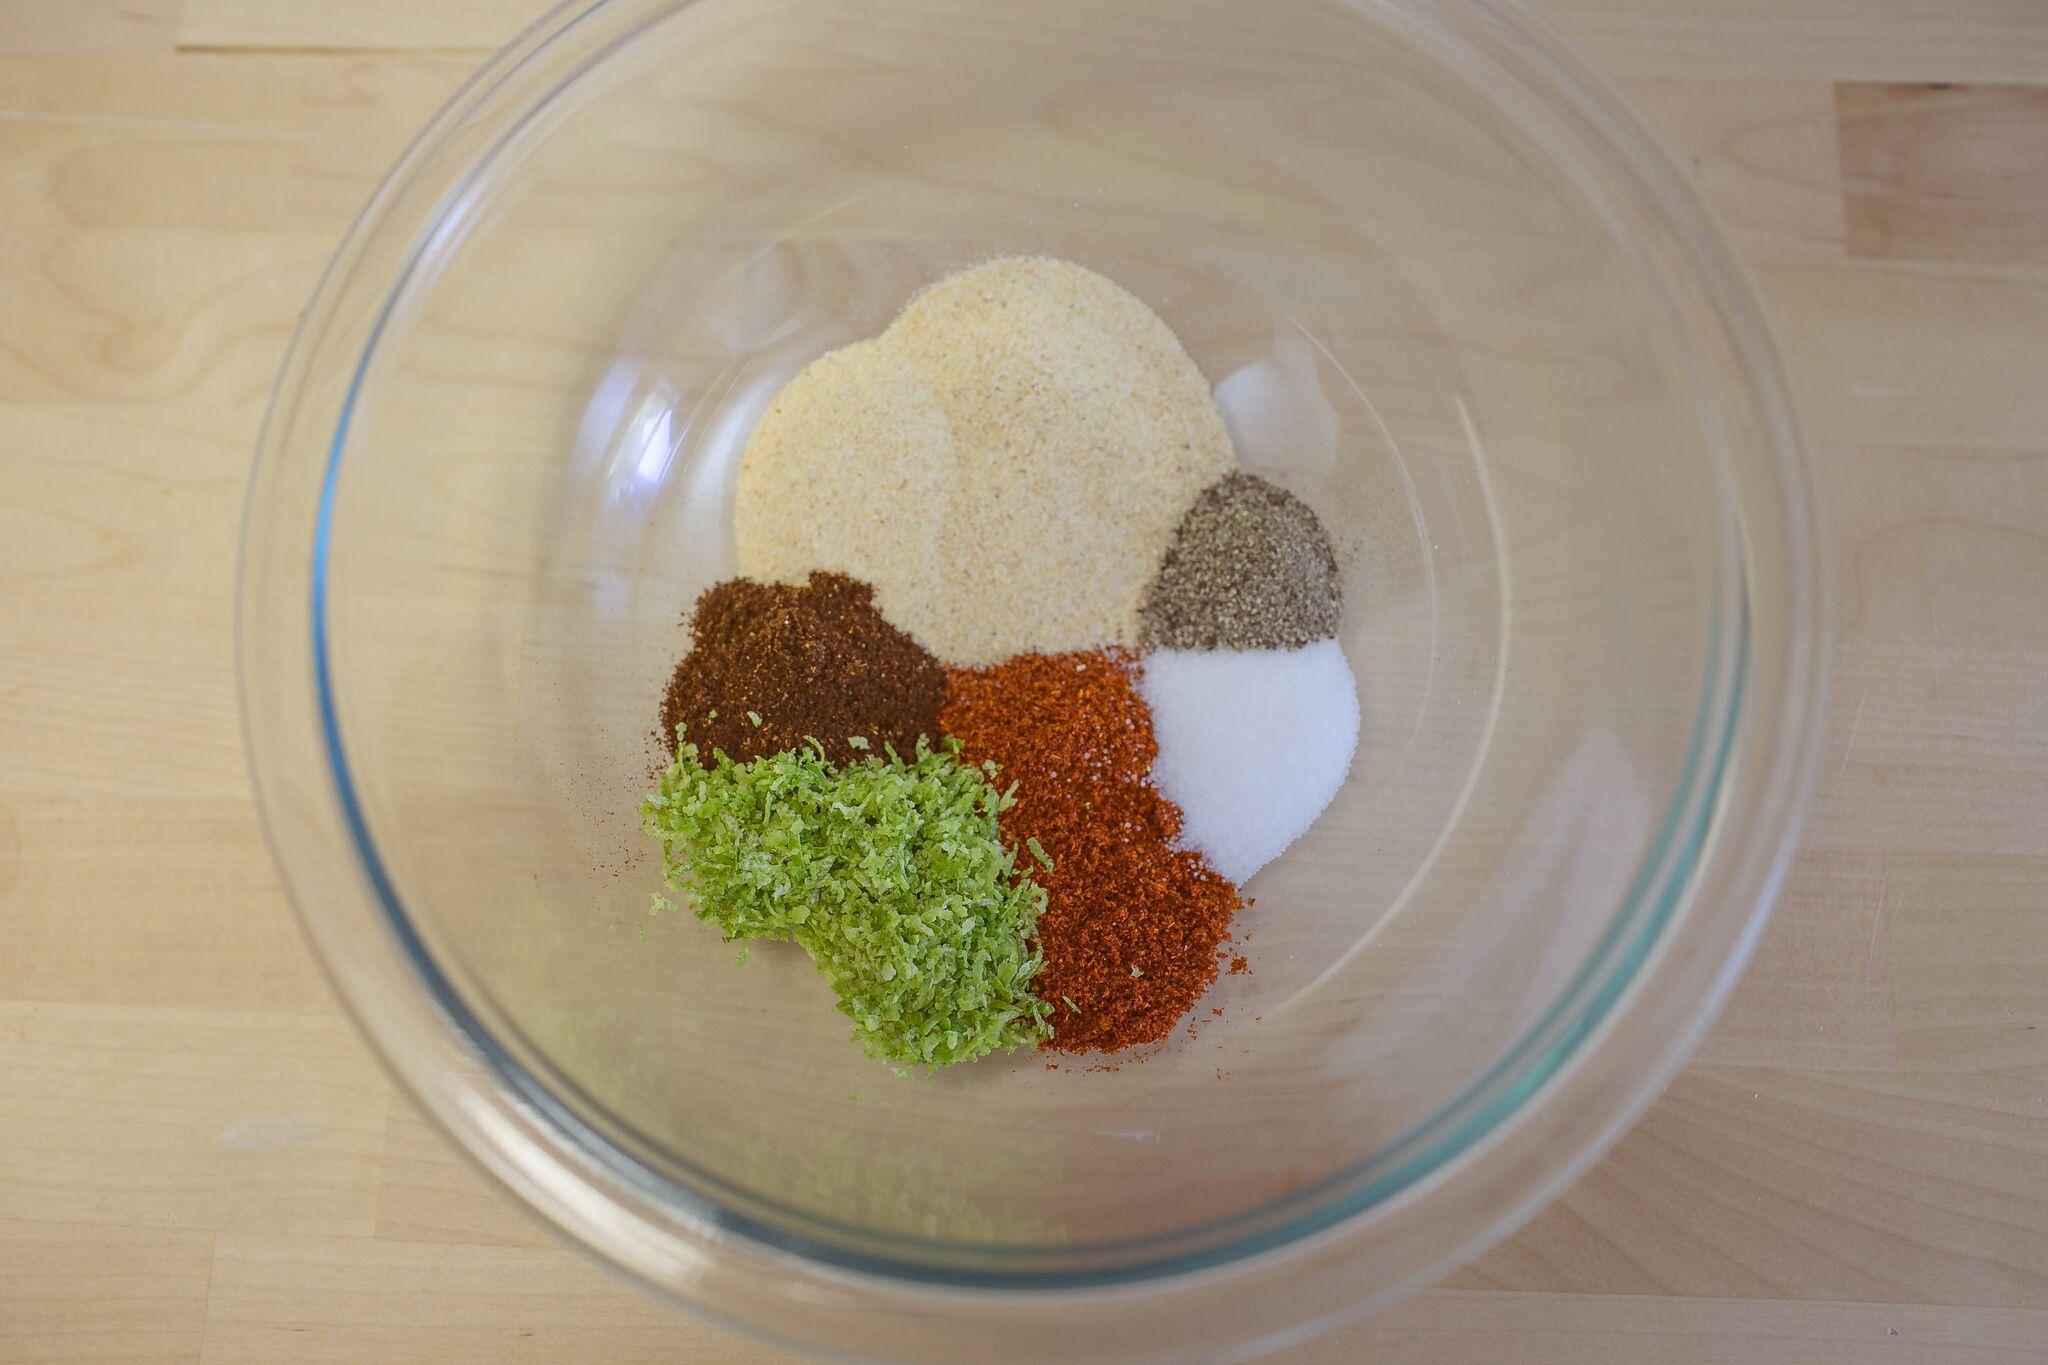 Add cayenne pepper, chili powder, garlic powder, lime zest, salt and pepper to bowl.